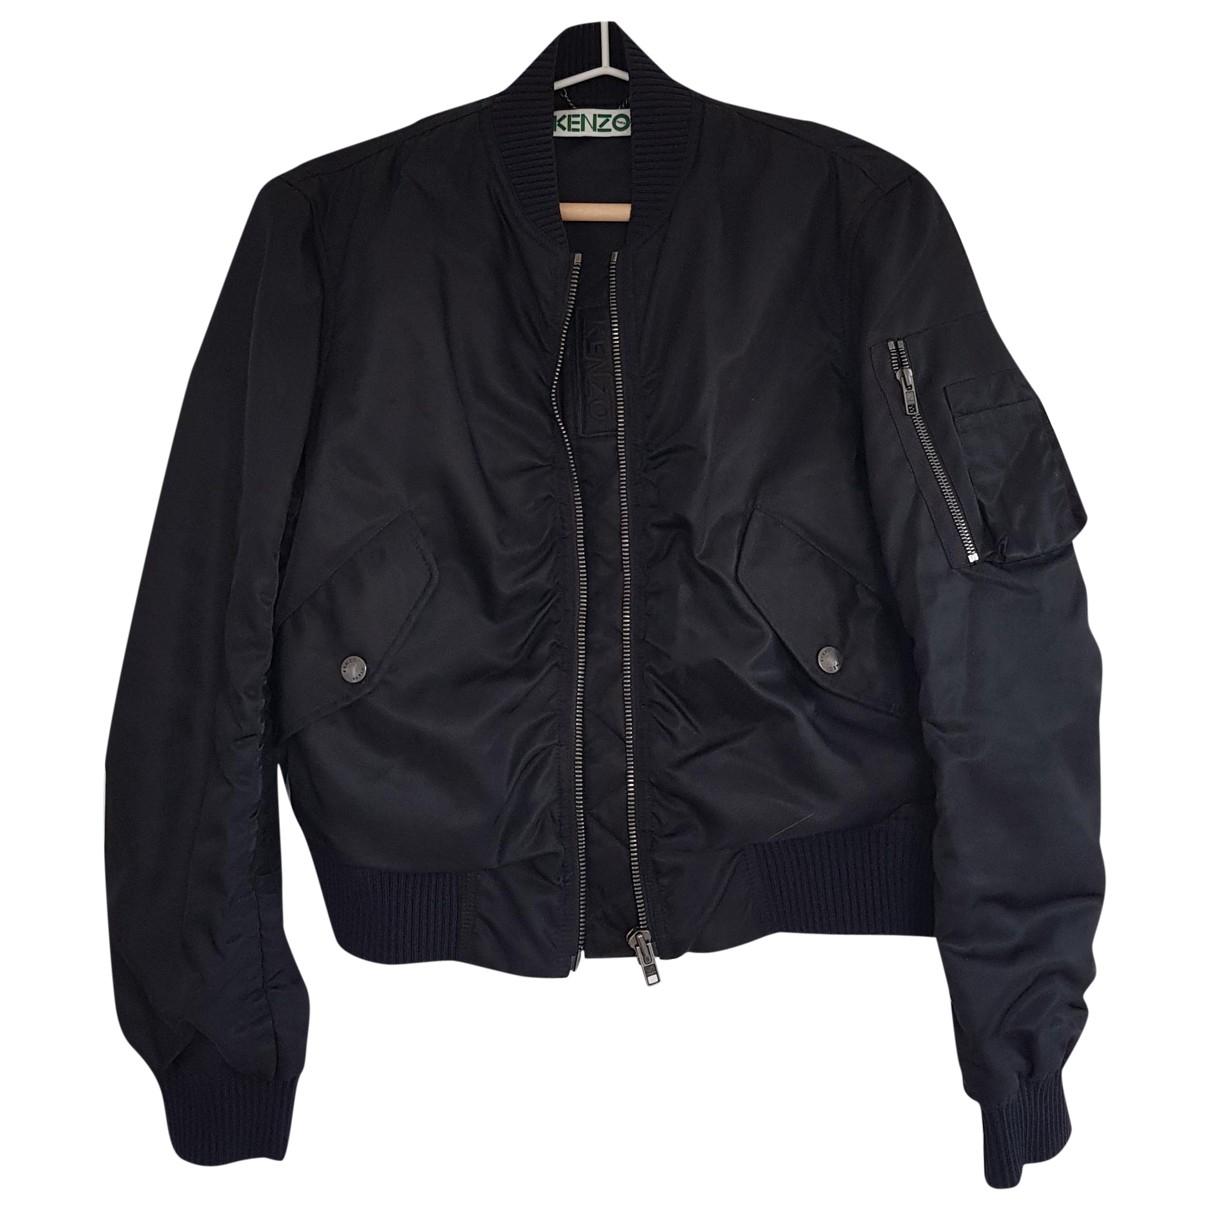 Kenzo \N Black jacket for Women S International